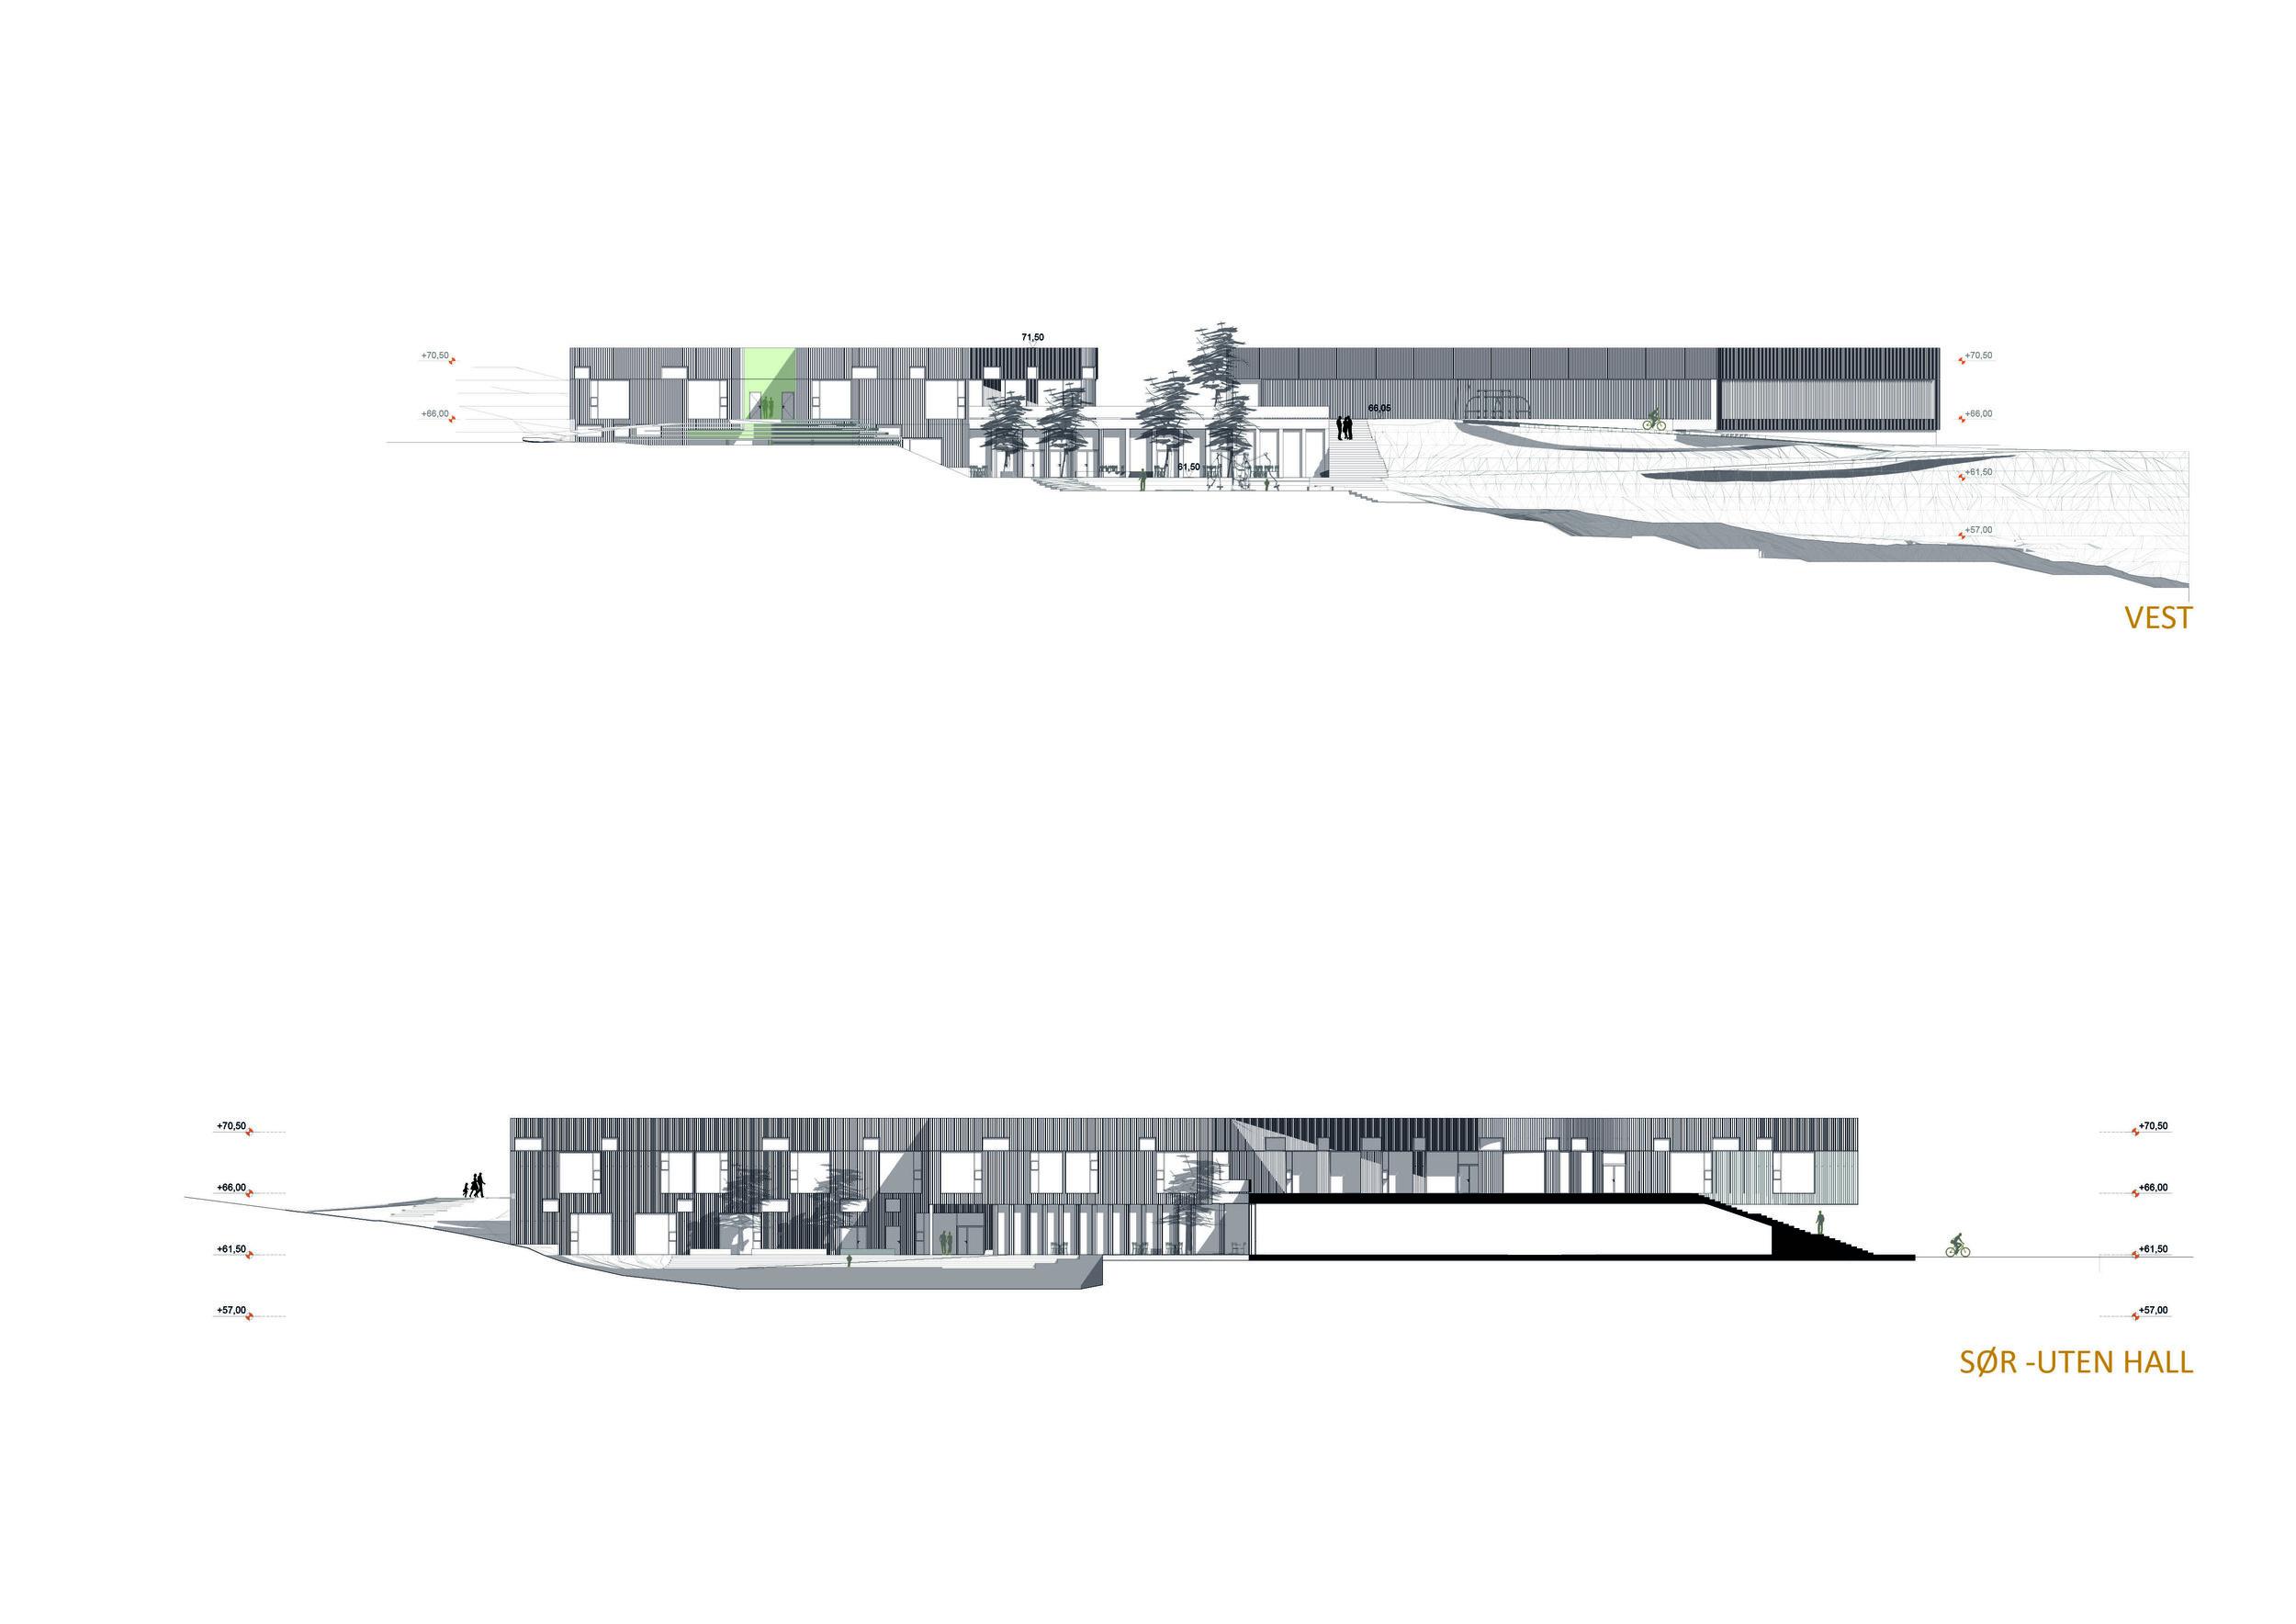 Knarvik_A325.jpg